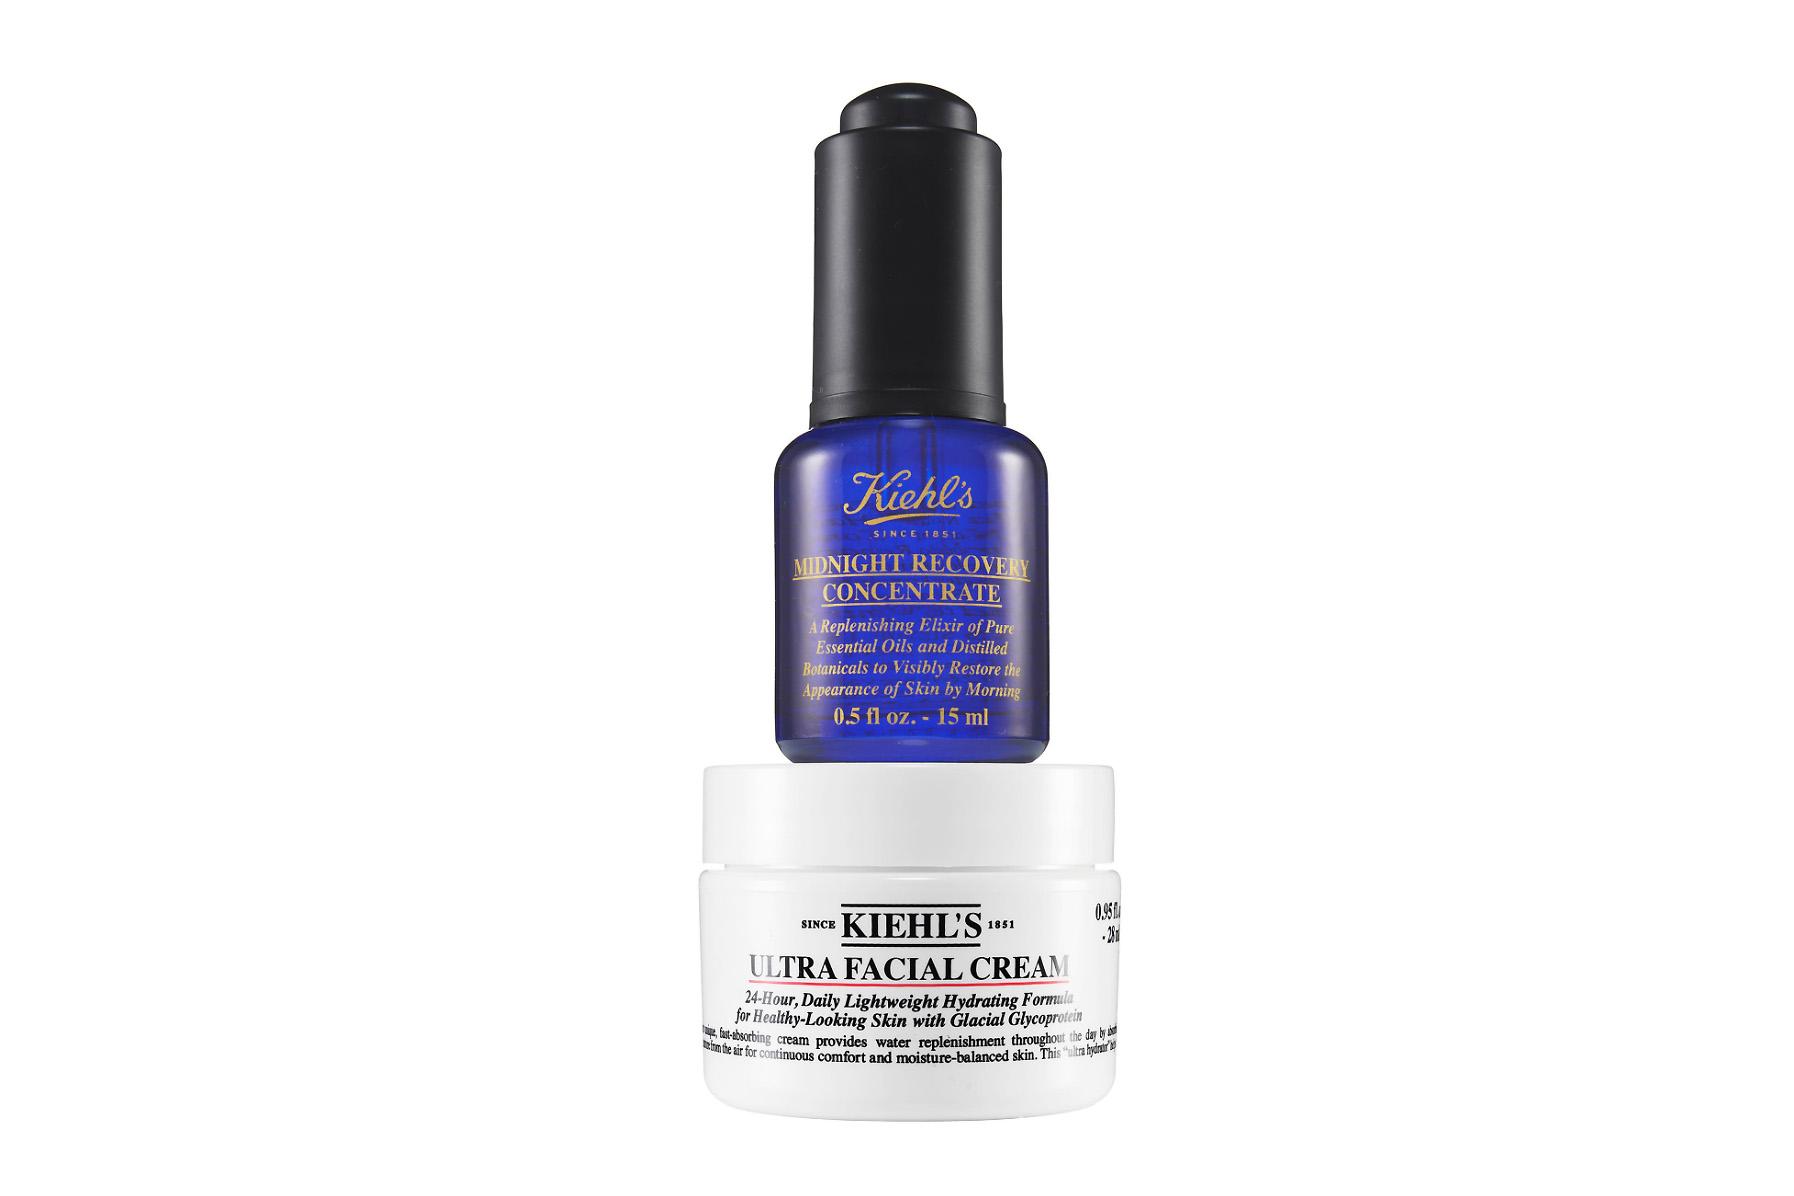 nordstrom anniversary sale kiehls beauty deals